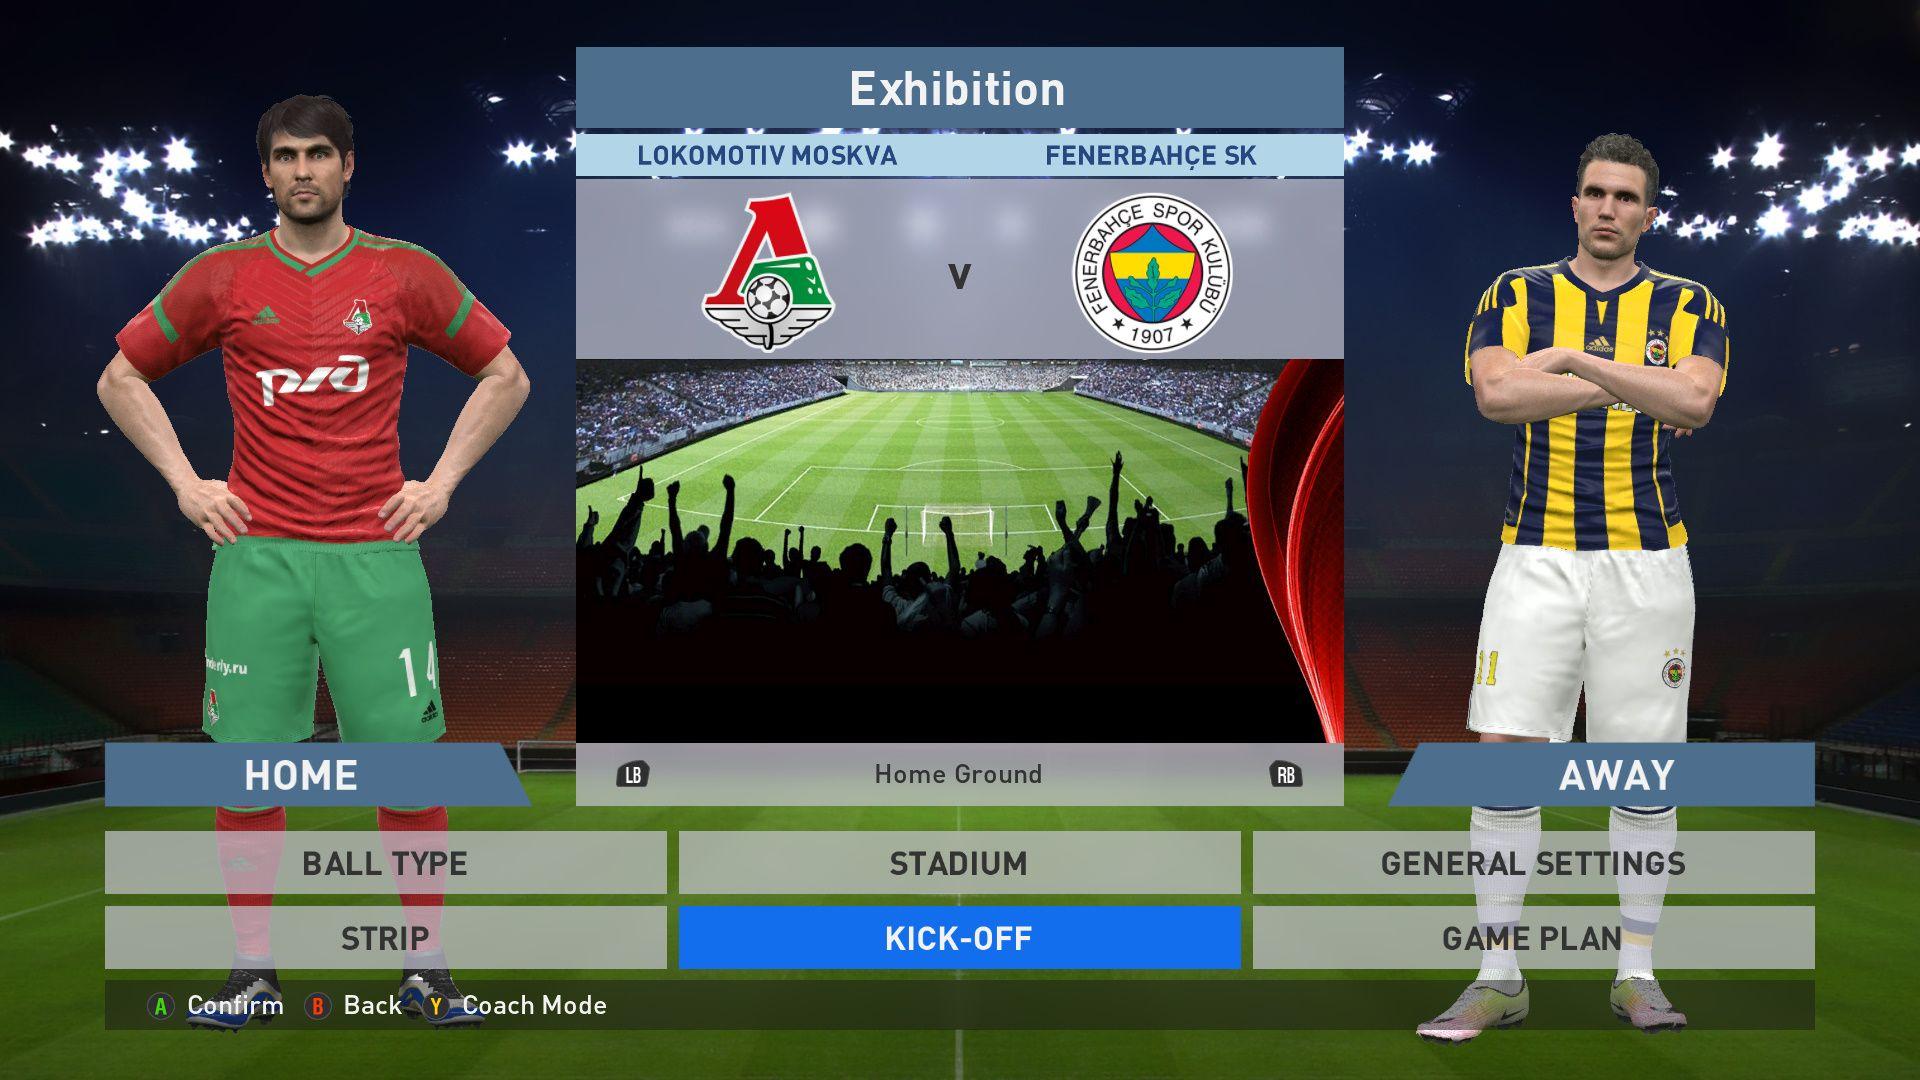 Lokomotiv Moskva Vs Fenerbahce Sk Lokomotiv Stadium Pes 2016 Pro Evolution Soccer 2016 Konami Pc Gameplay Pcga Pro Evolution Soccer Fenerbahce Sk Stadium